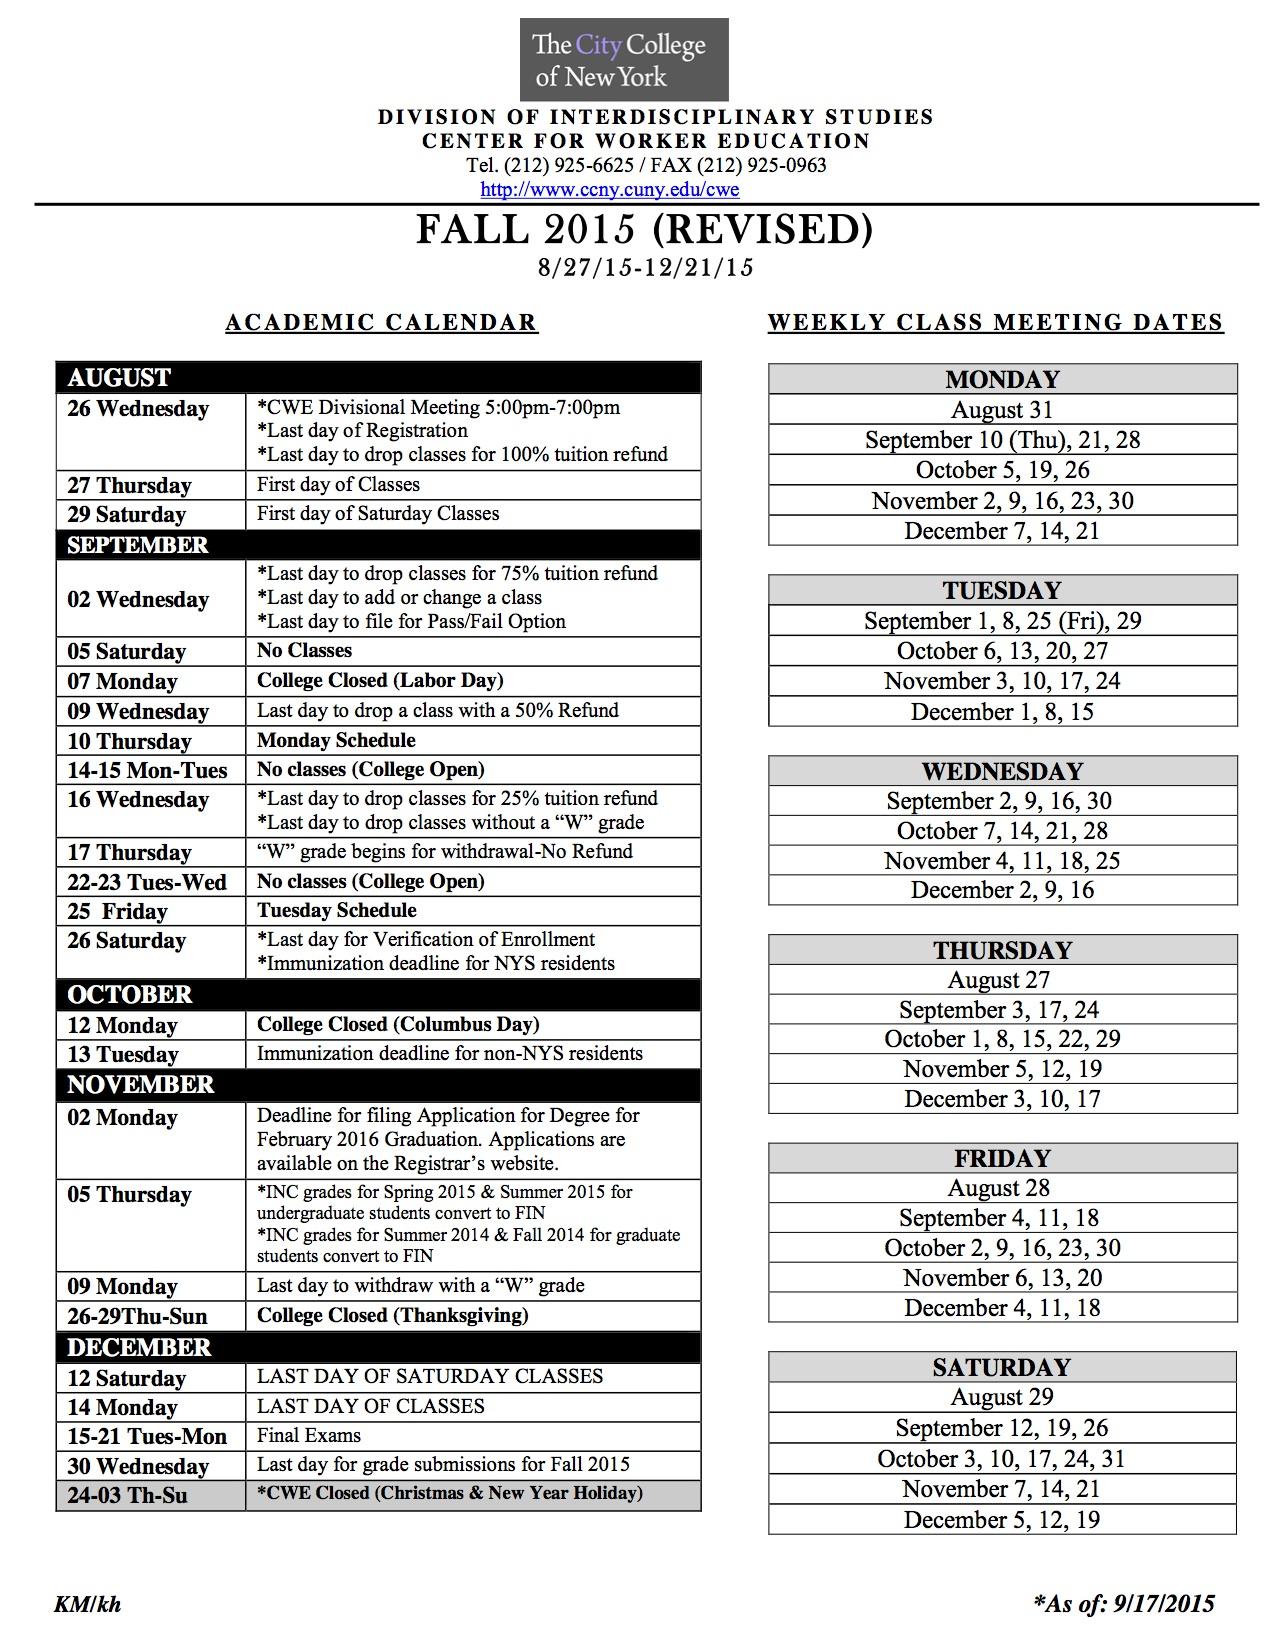 Academic Calendar | The City College Of New York Within Suffolk Community College Academic Calendar